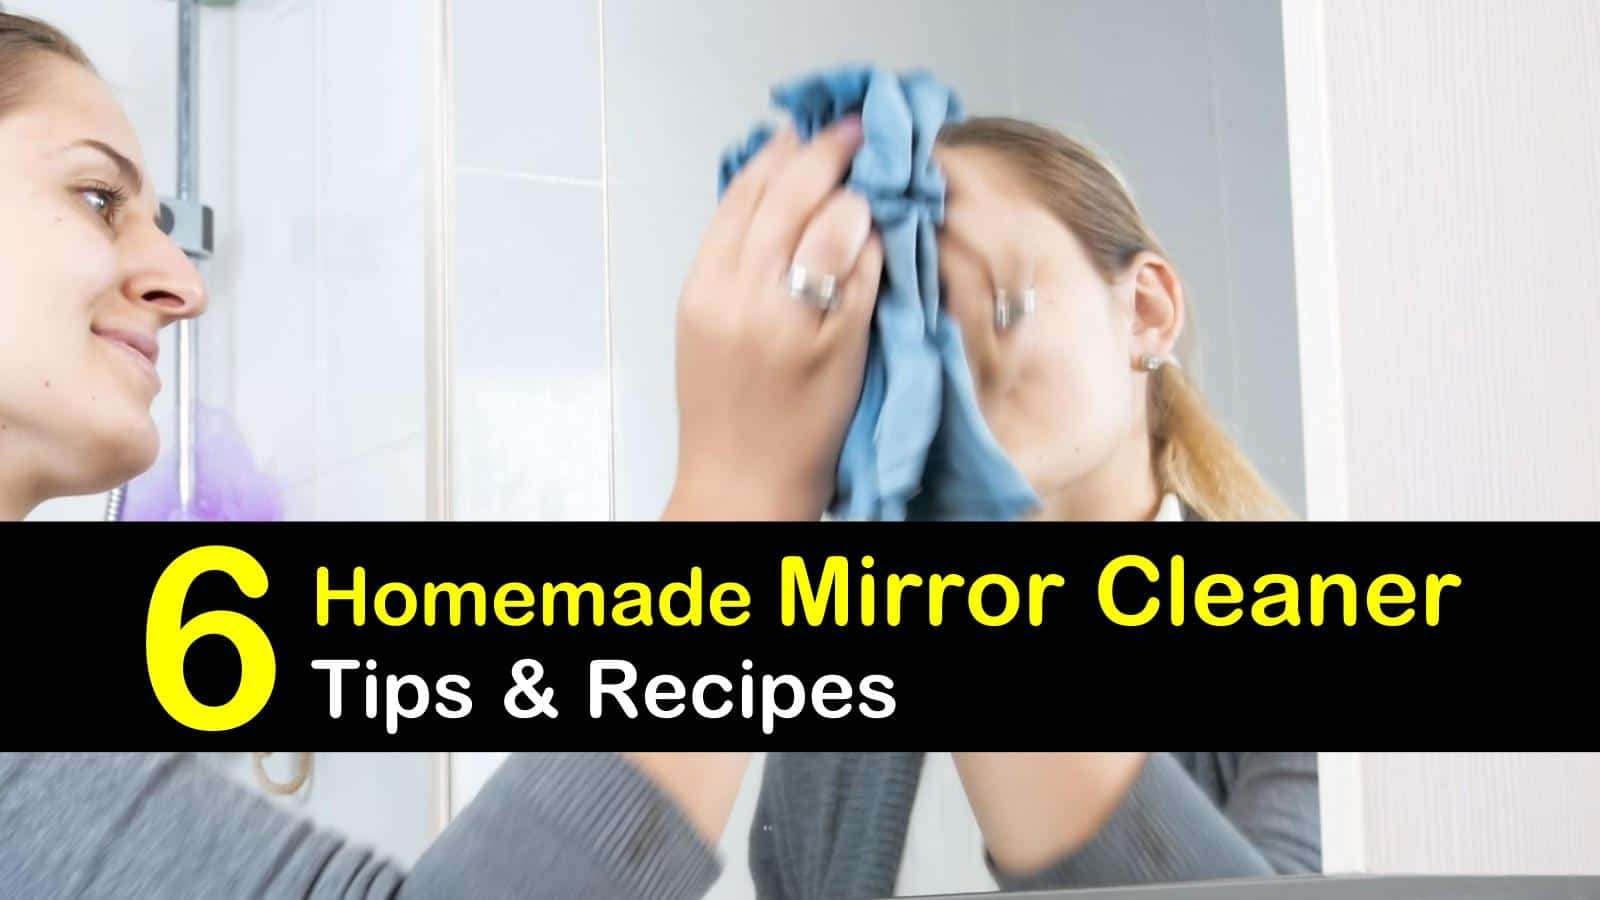 homemade mirror cleaner titleimg1